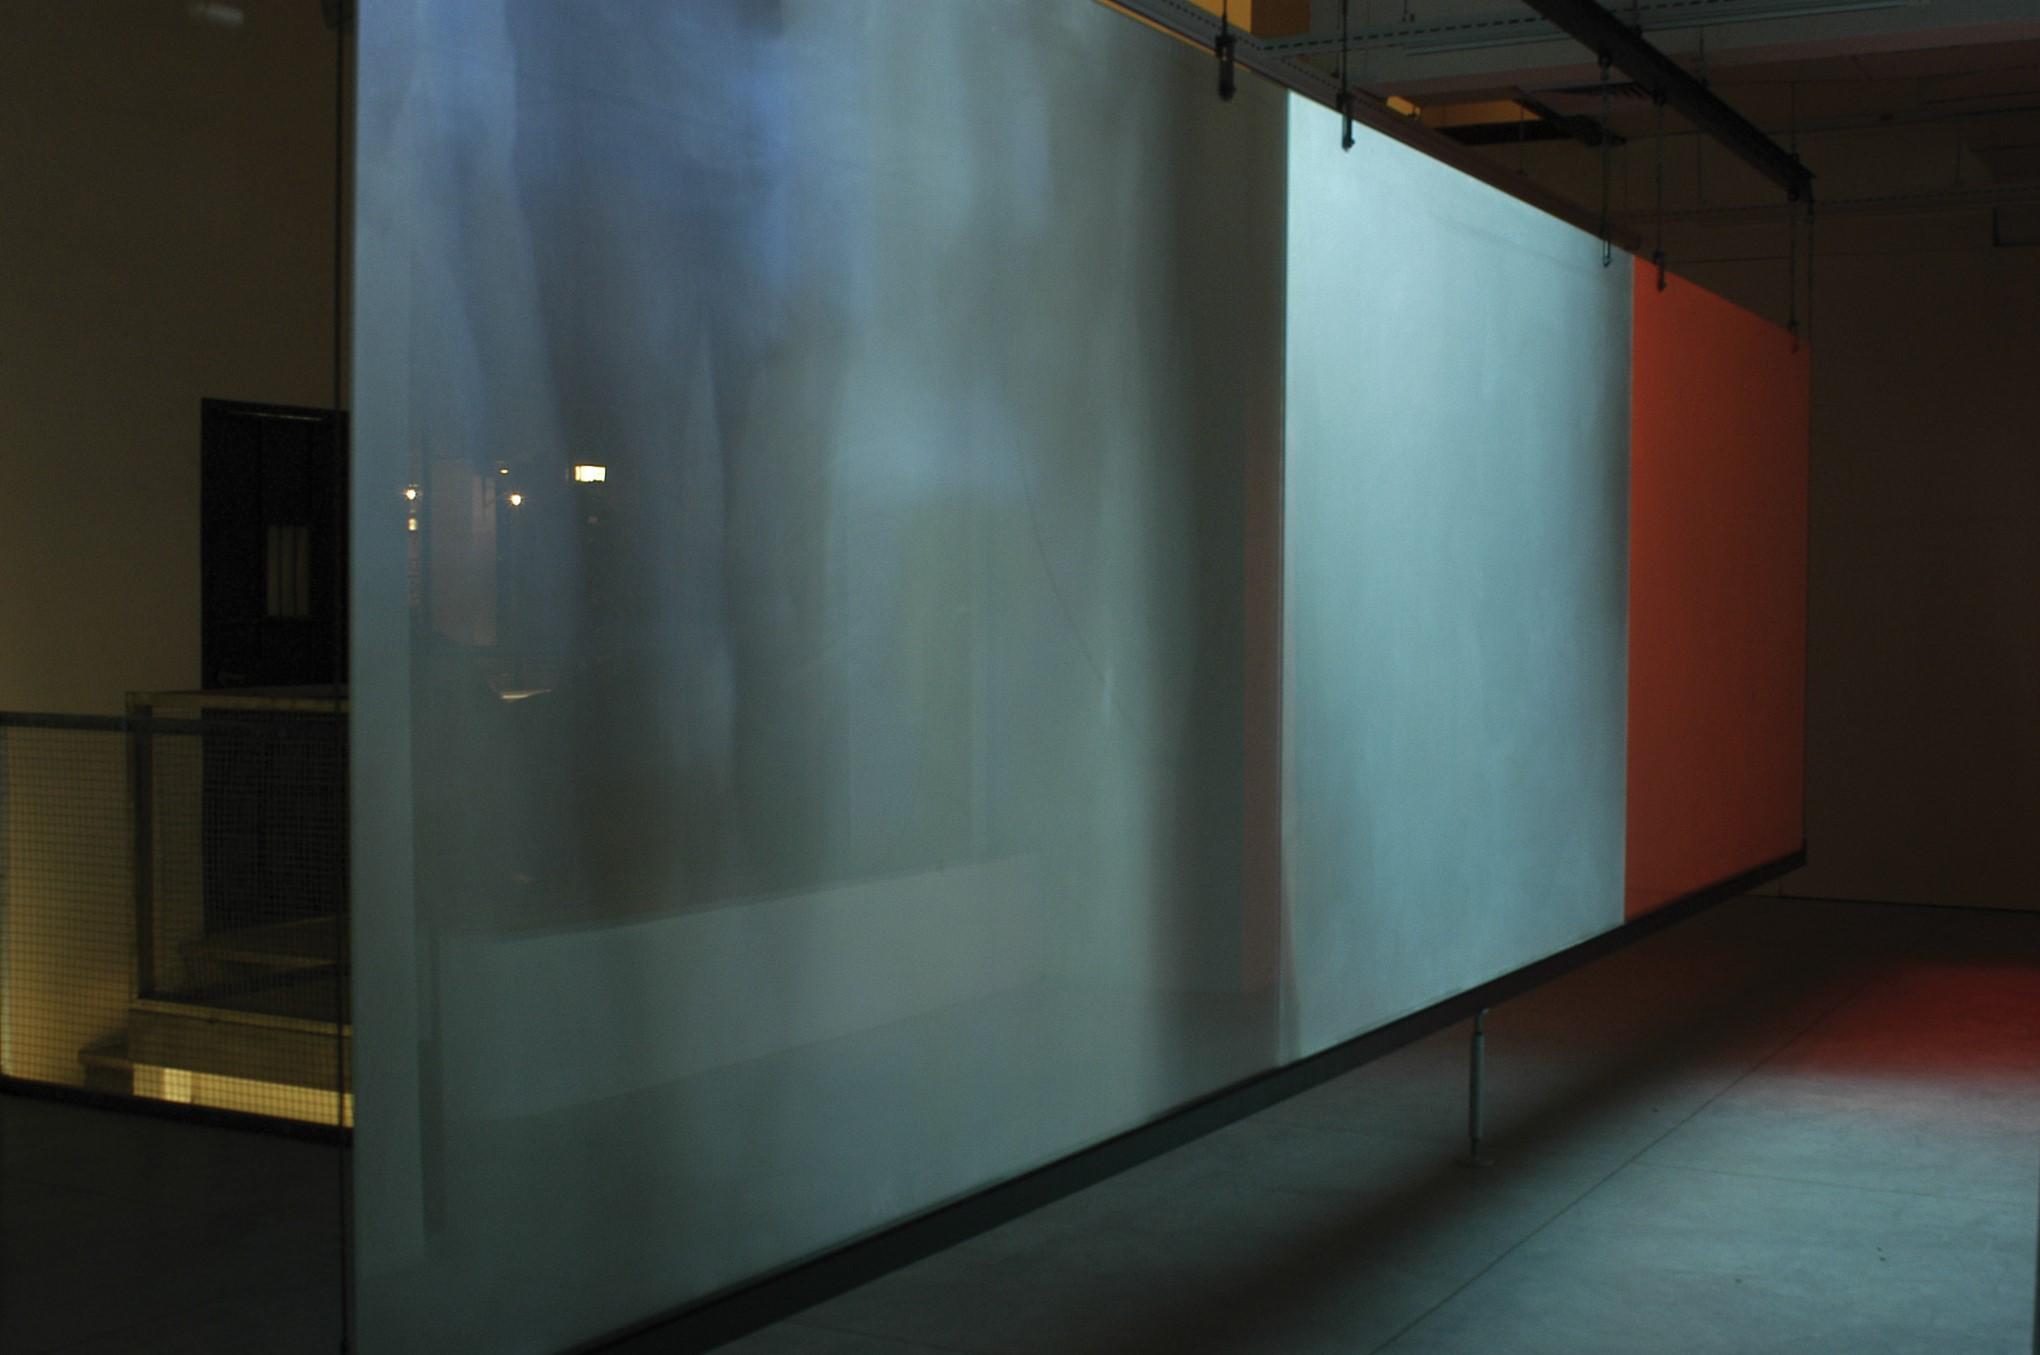 Nira Pereg, Canicule, Installation View, Braverman Gallery, Tel Aviv